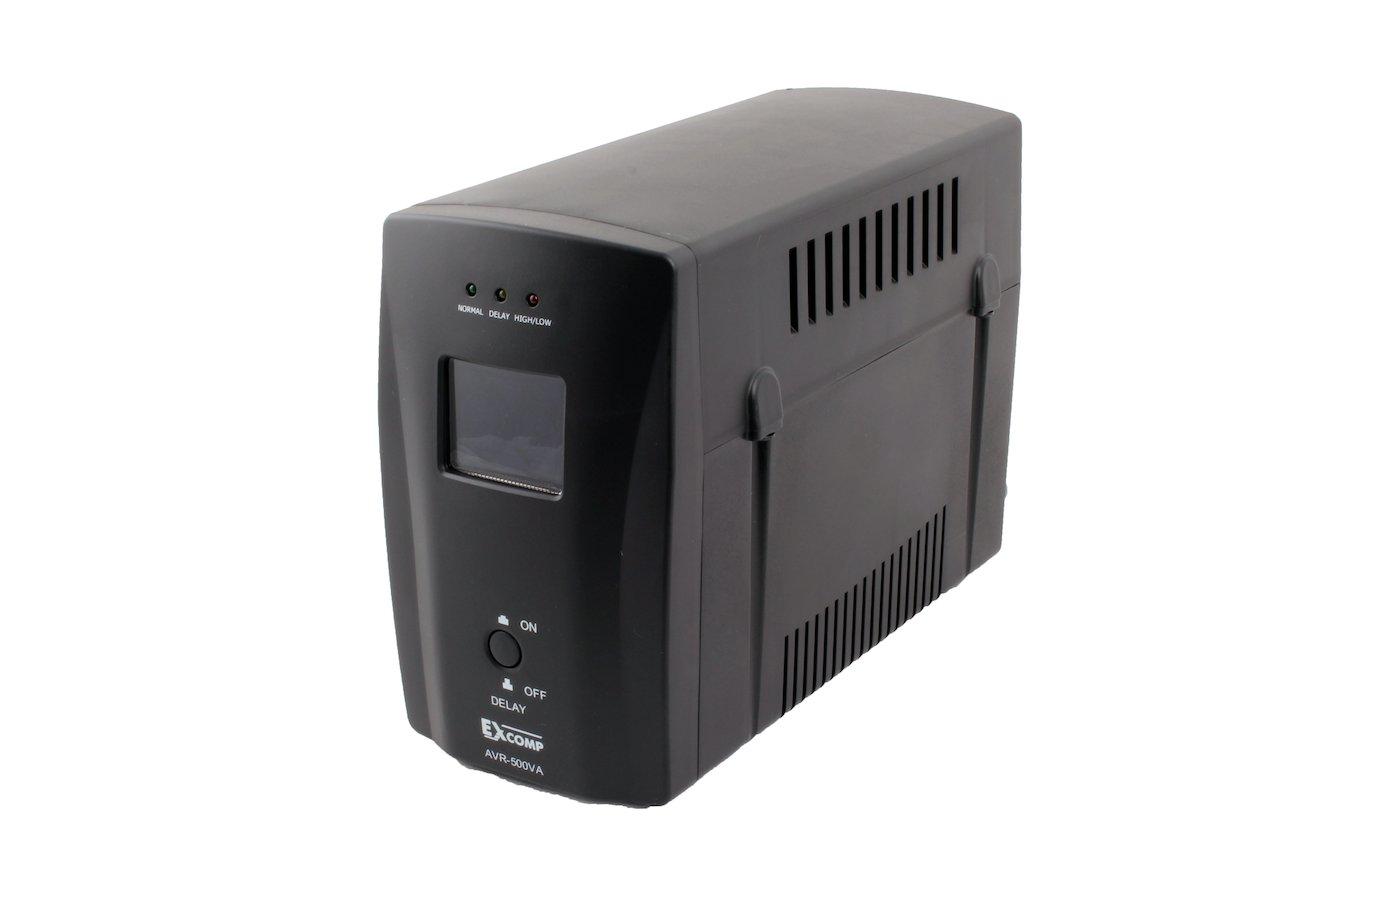 Стабилизатор напряжения EXCOMP AVR 500VA LCD (EXPERTLINE)